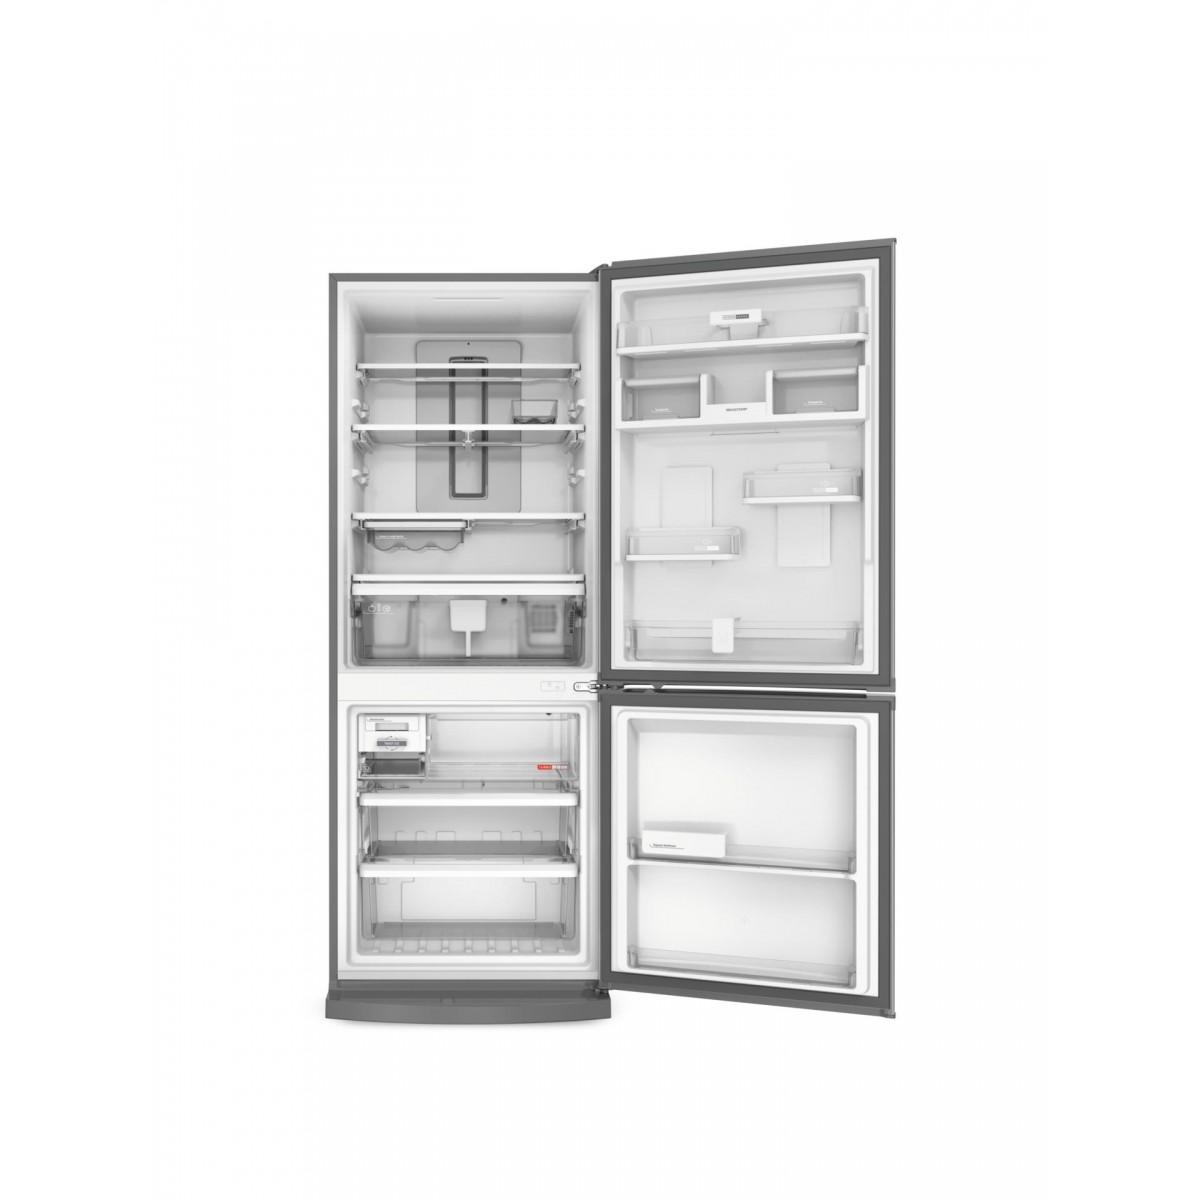 Geladeira Brastemp Frost Free 443 litros - BRE57AK